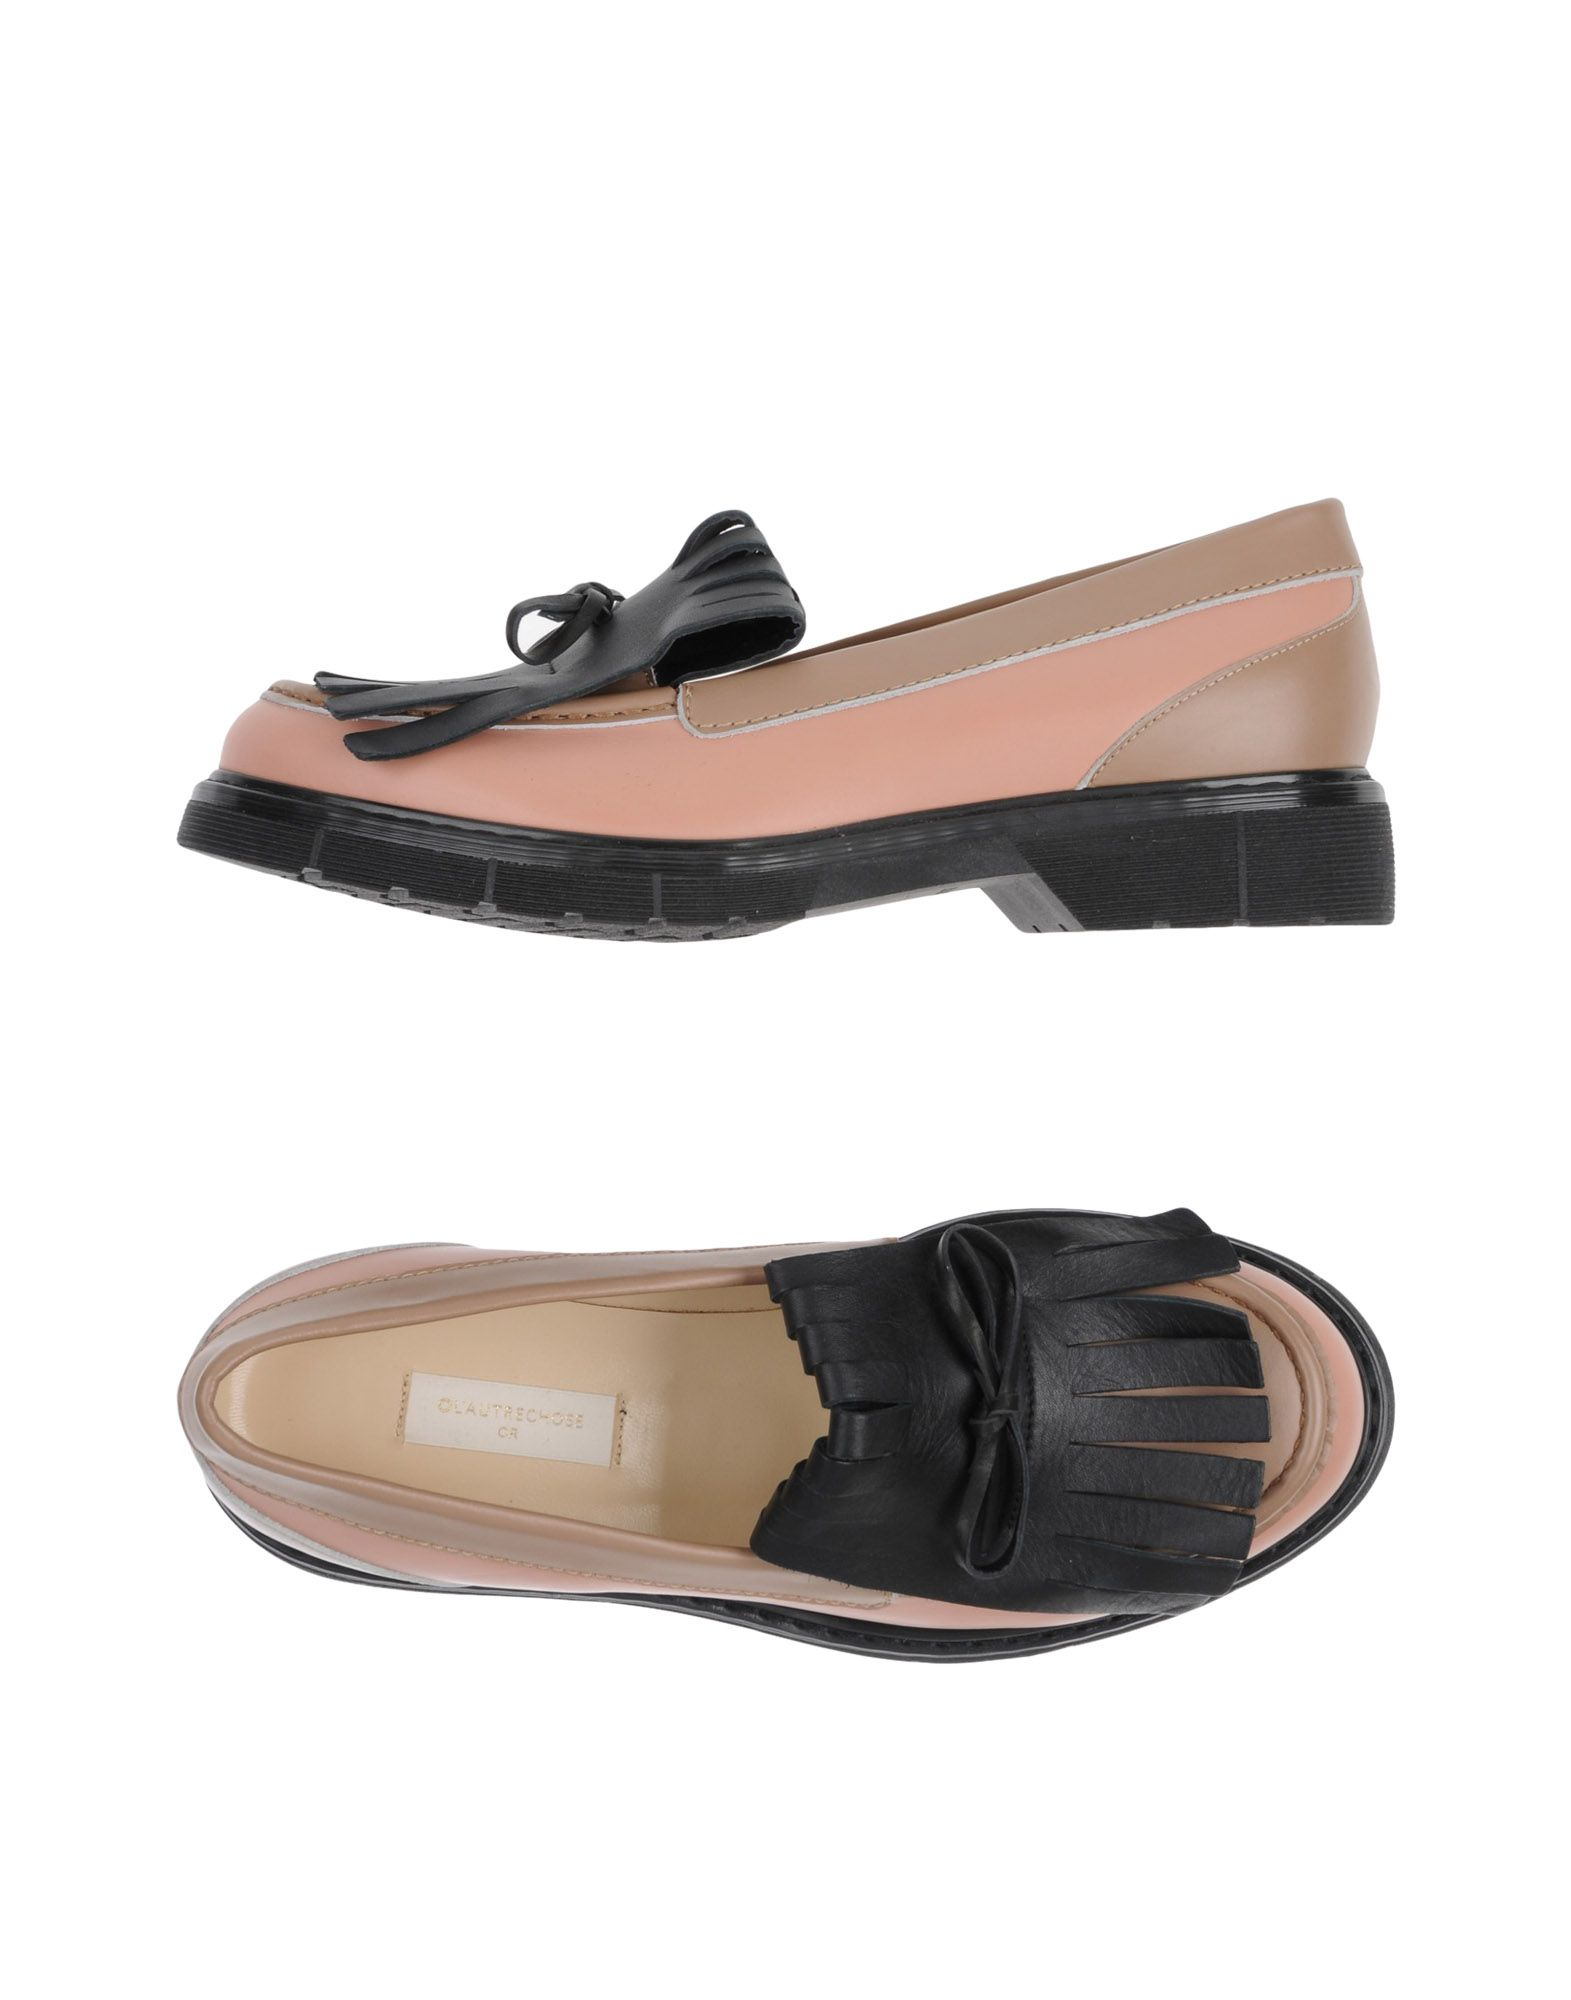 L' Autre Chose Mokassins Damen  11251385QVGut aussehende strapazierfähige Schuhe